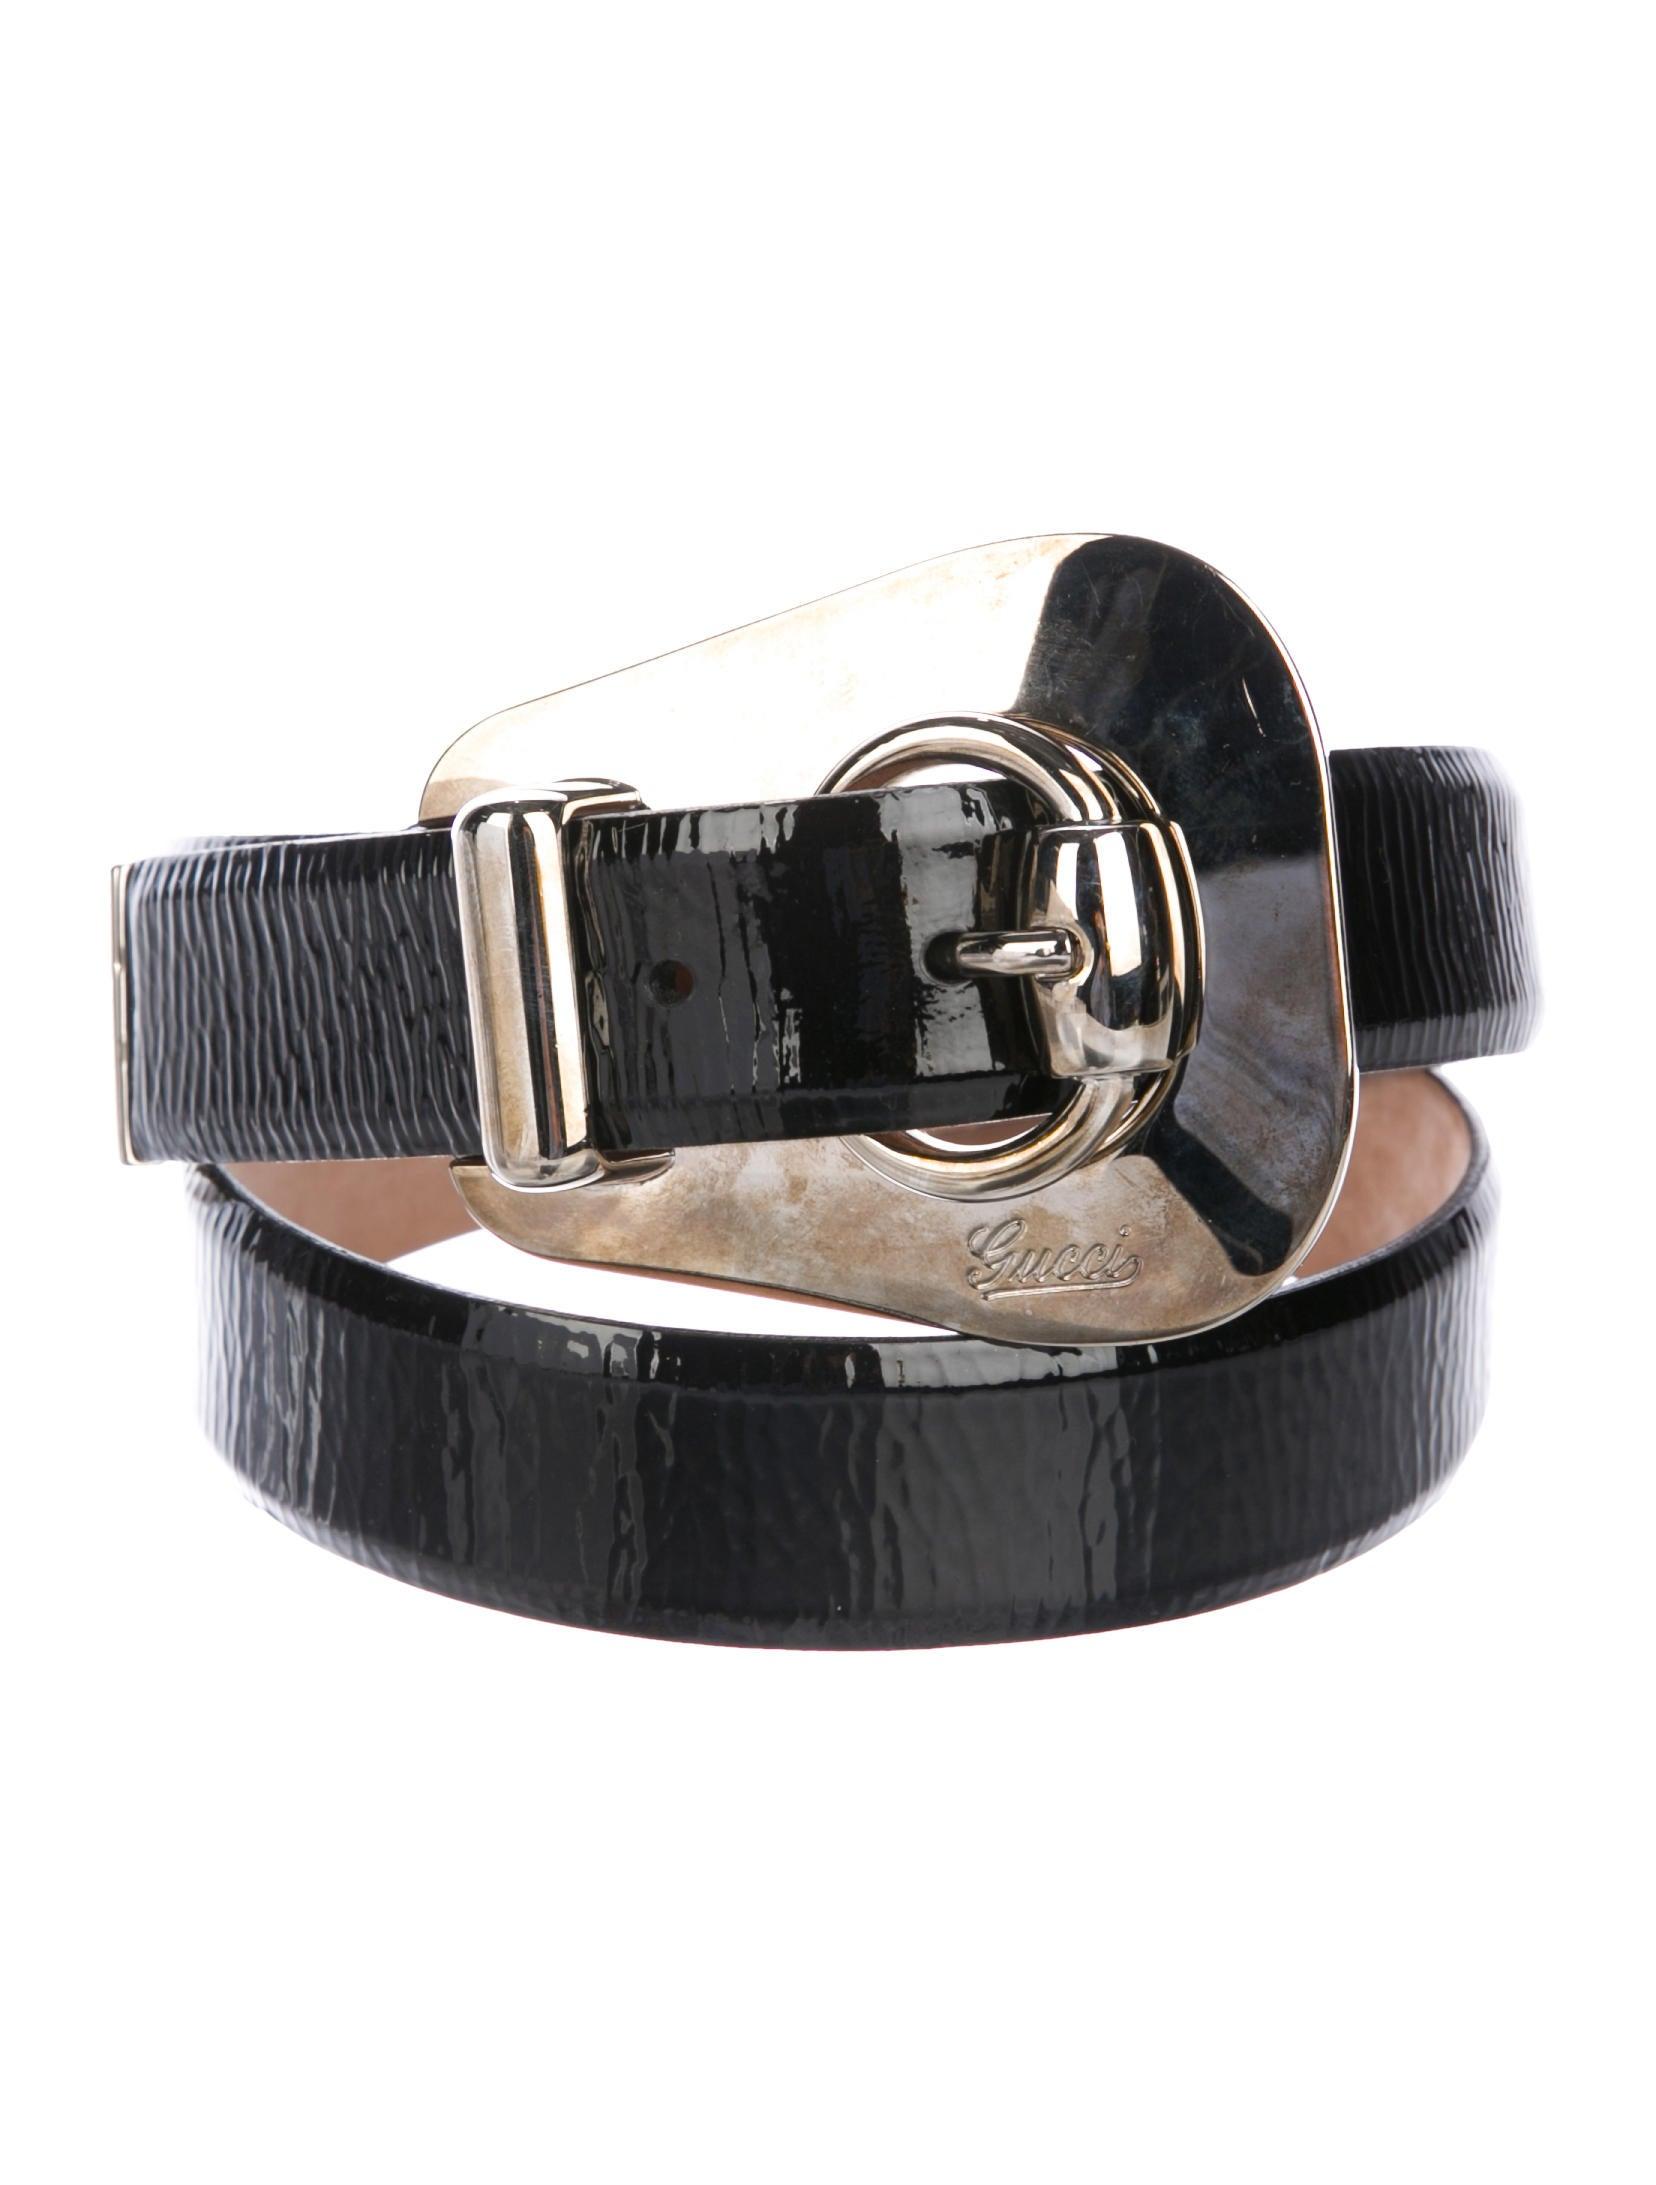 ac141b783b5 Gucci Patent Leather Buckle Belt - Accessories - GUC230299